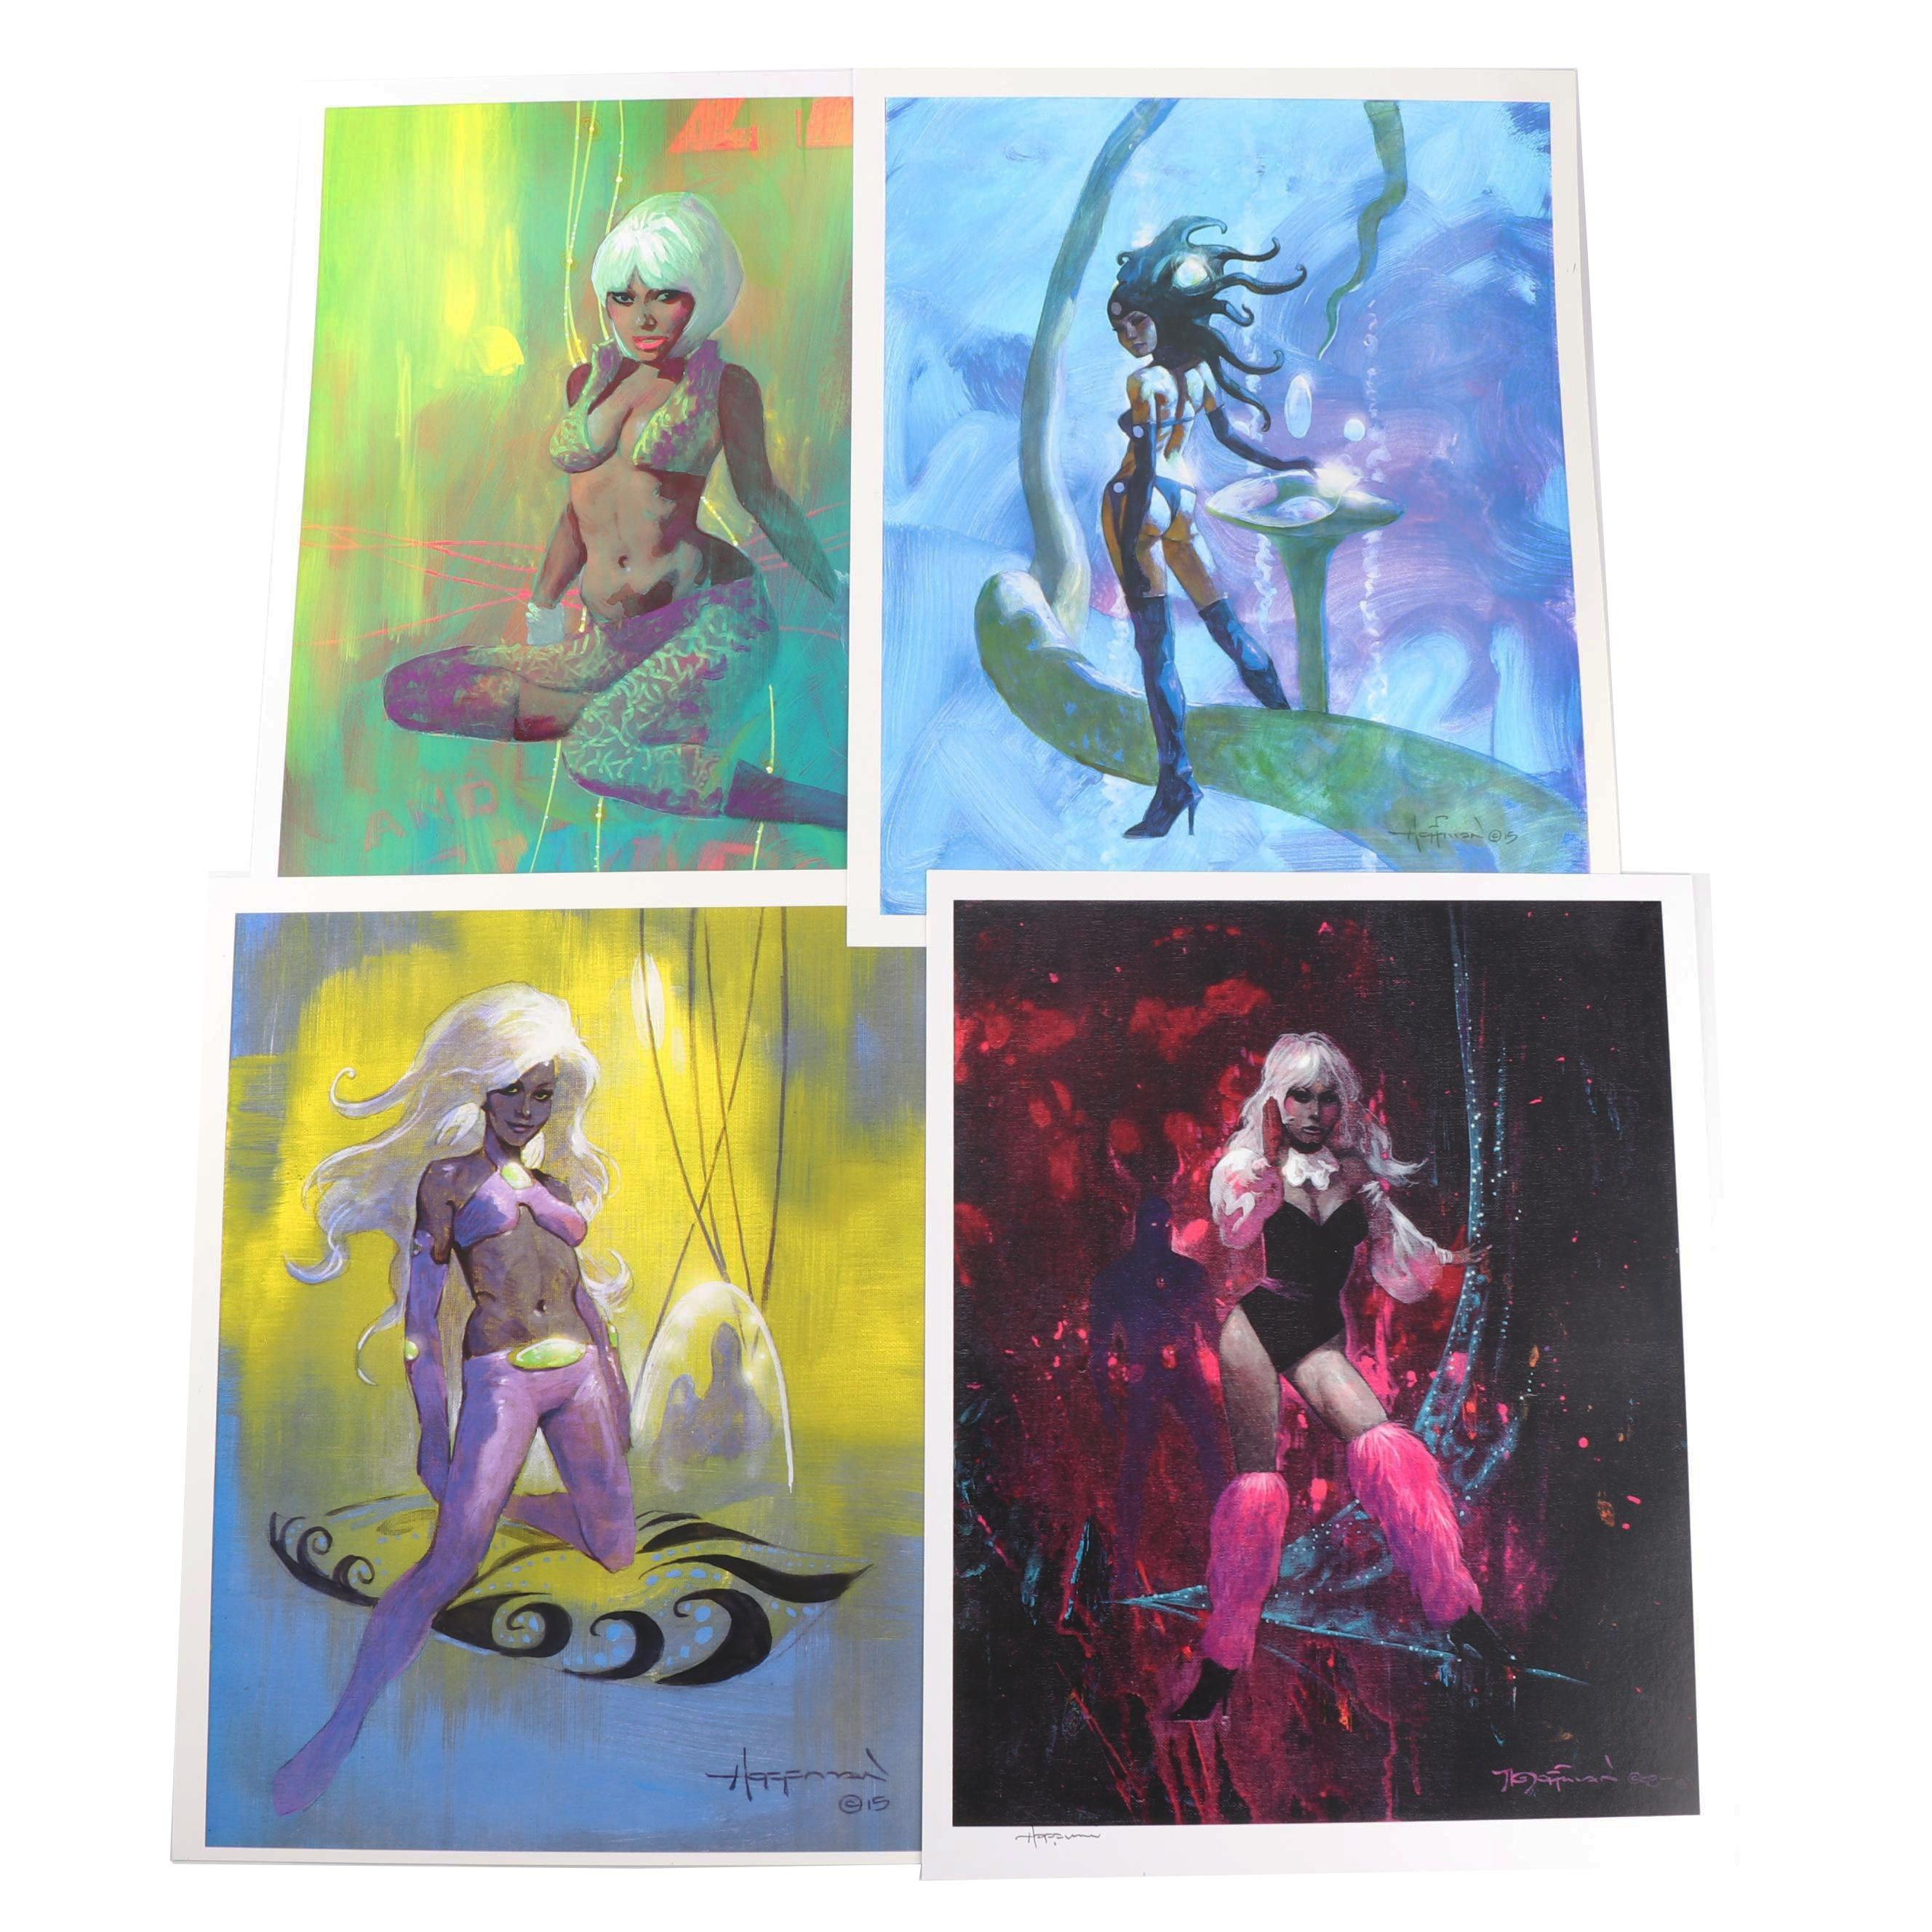 Fantasy Art Offset Lithographs after Mike Hoffmann